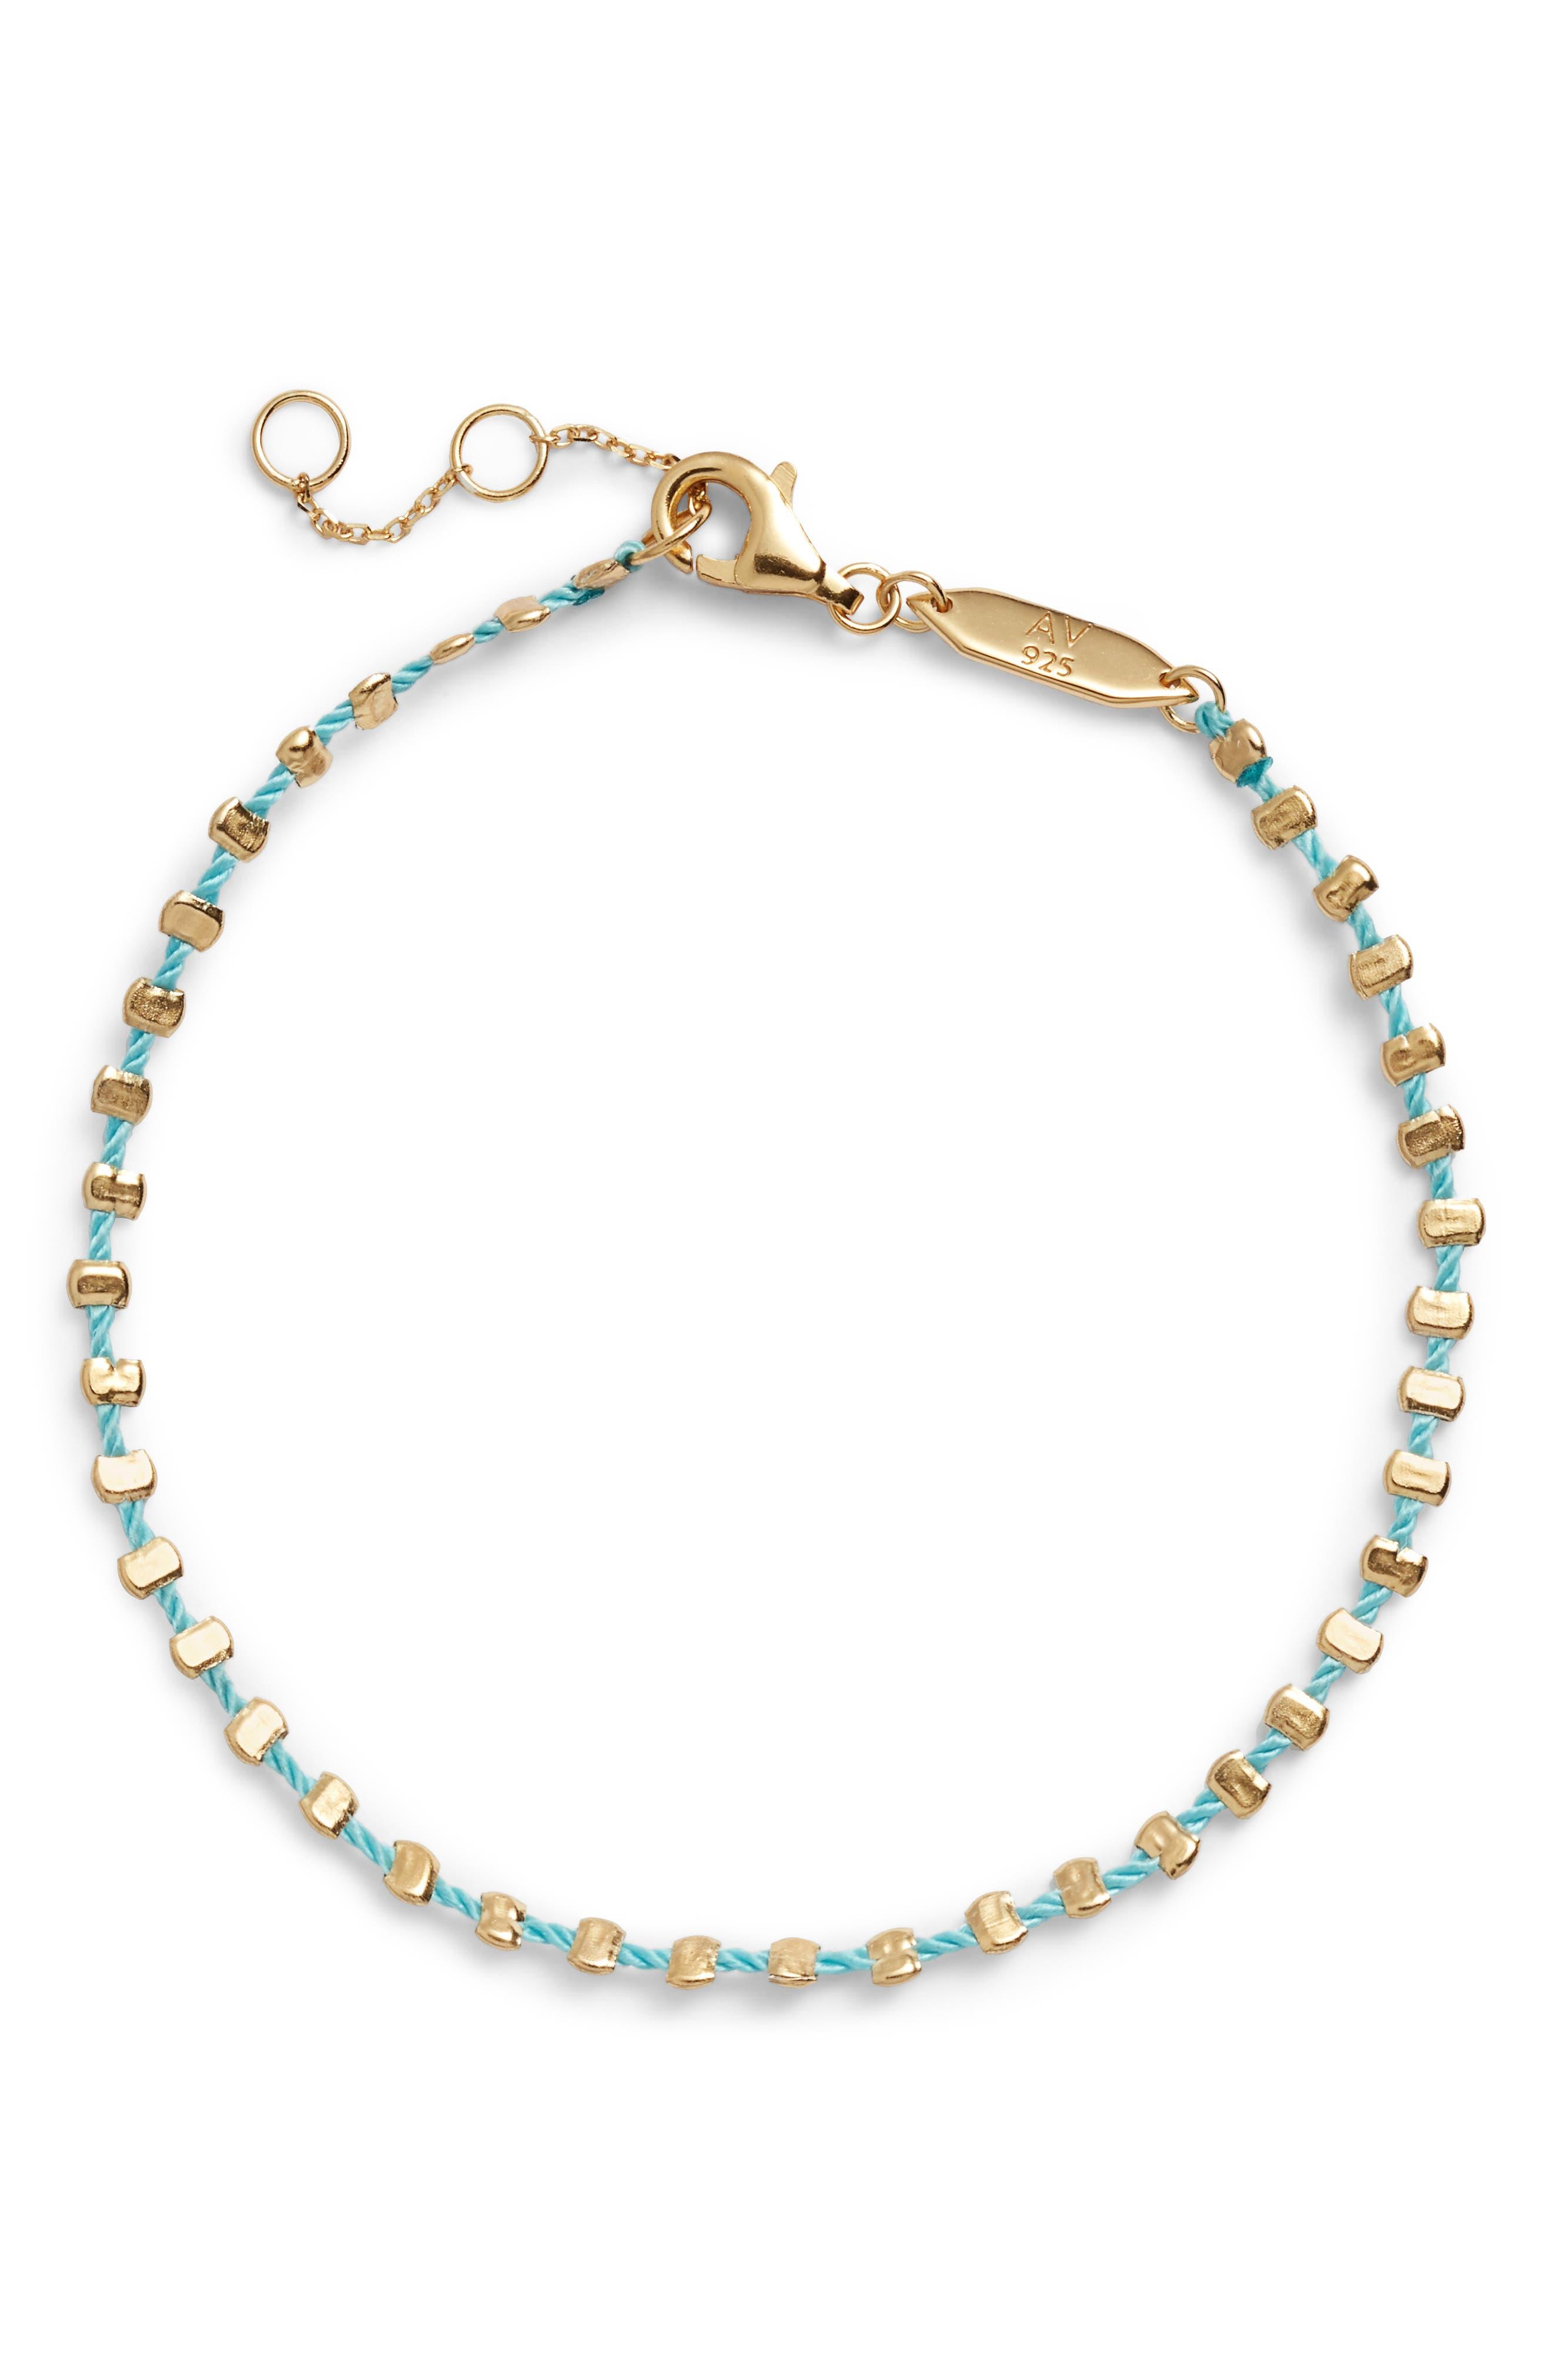 Argento Vivo Sydney Vermeil Studded Teal Band Bracelet